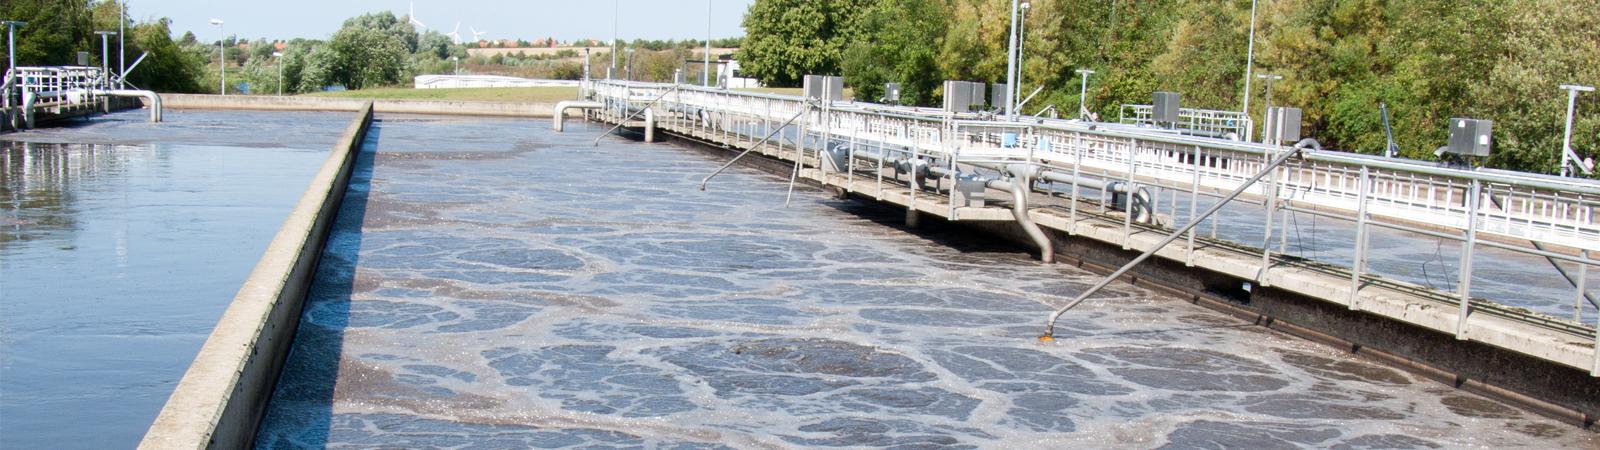 Aerobic granular sludge, a new technology for municipal wastewater